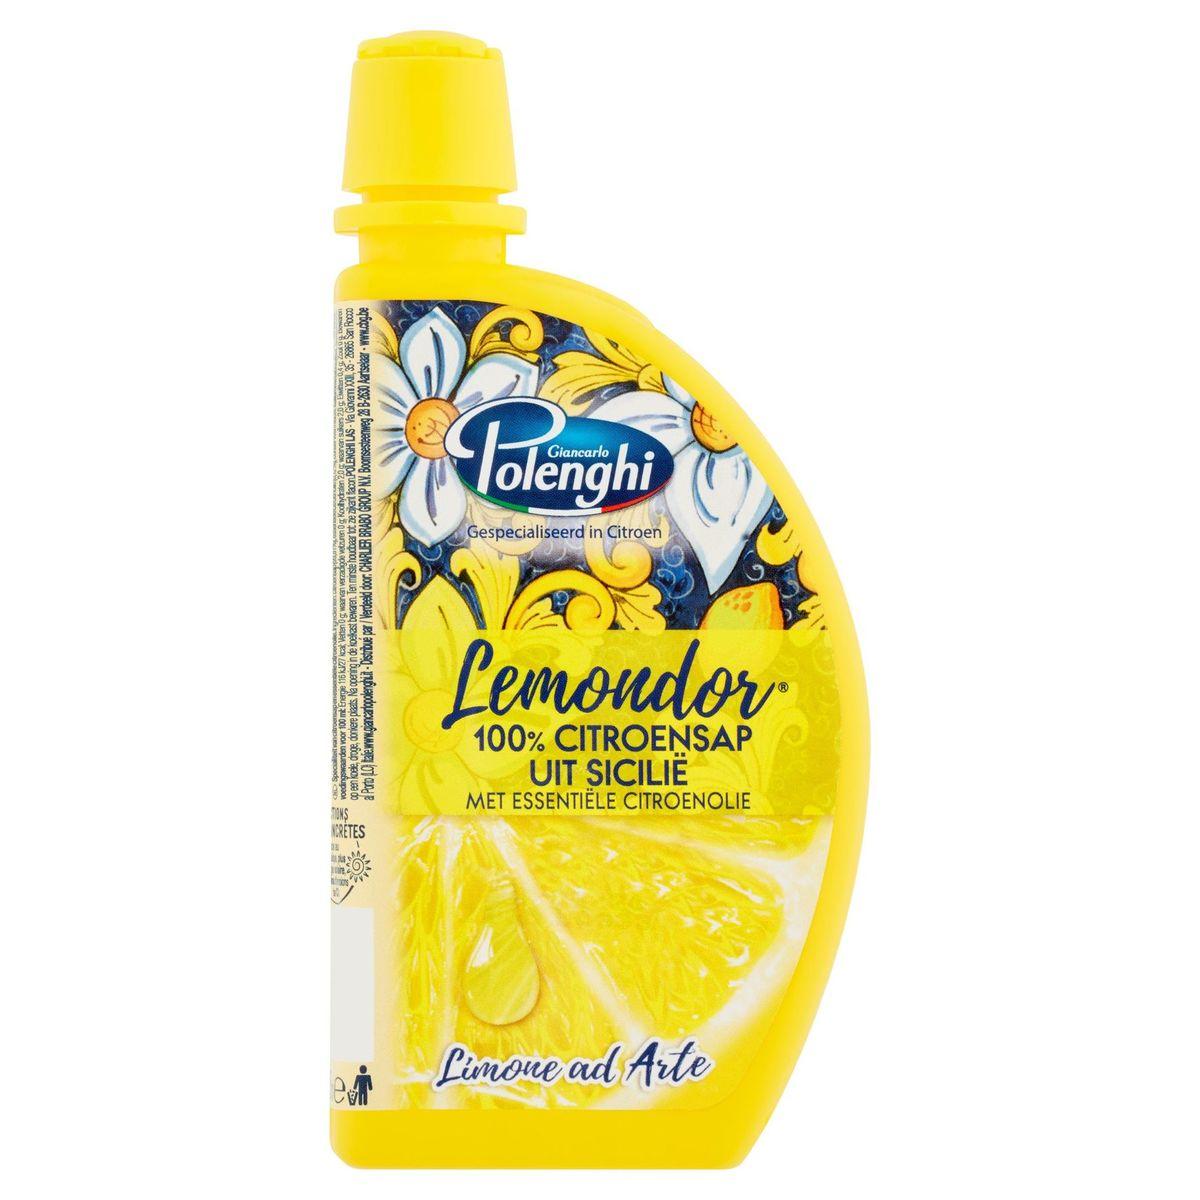 Lemondor 100% Citroensap uit Sicilië met Essentiële Citroenolie 125 ml